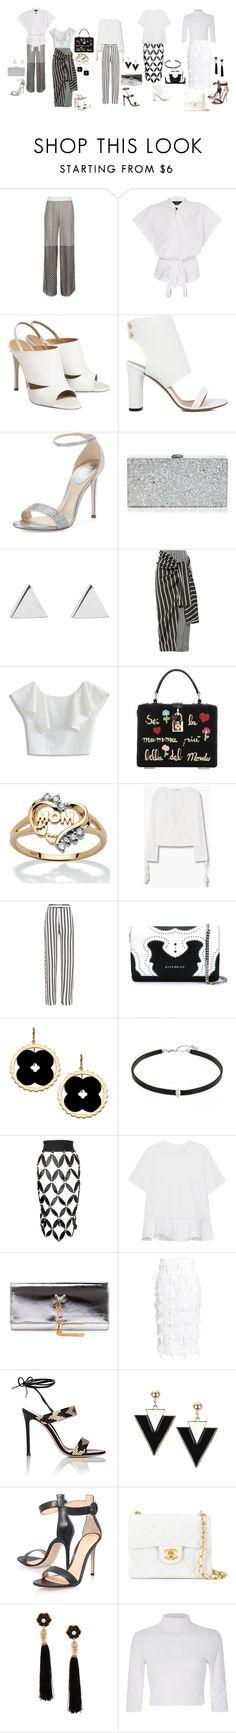 """a"" by yusufbudiman on Polyvore featuring Cecilia Pradomurion, IRO, René Caovilla, Milly, Jennifer Meyer Jewelry, Joseph, Chicwish, Dolce&Gabbana, Palm Beach Jewelry and MANGO"